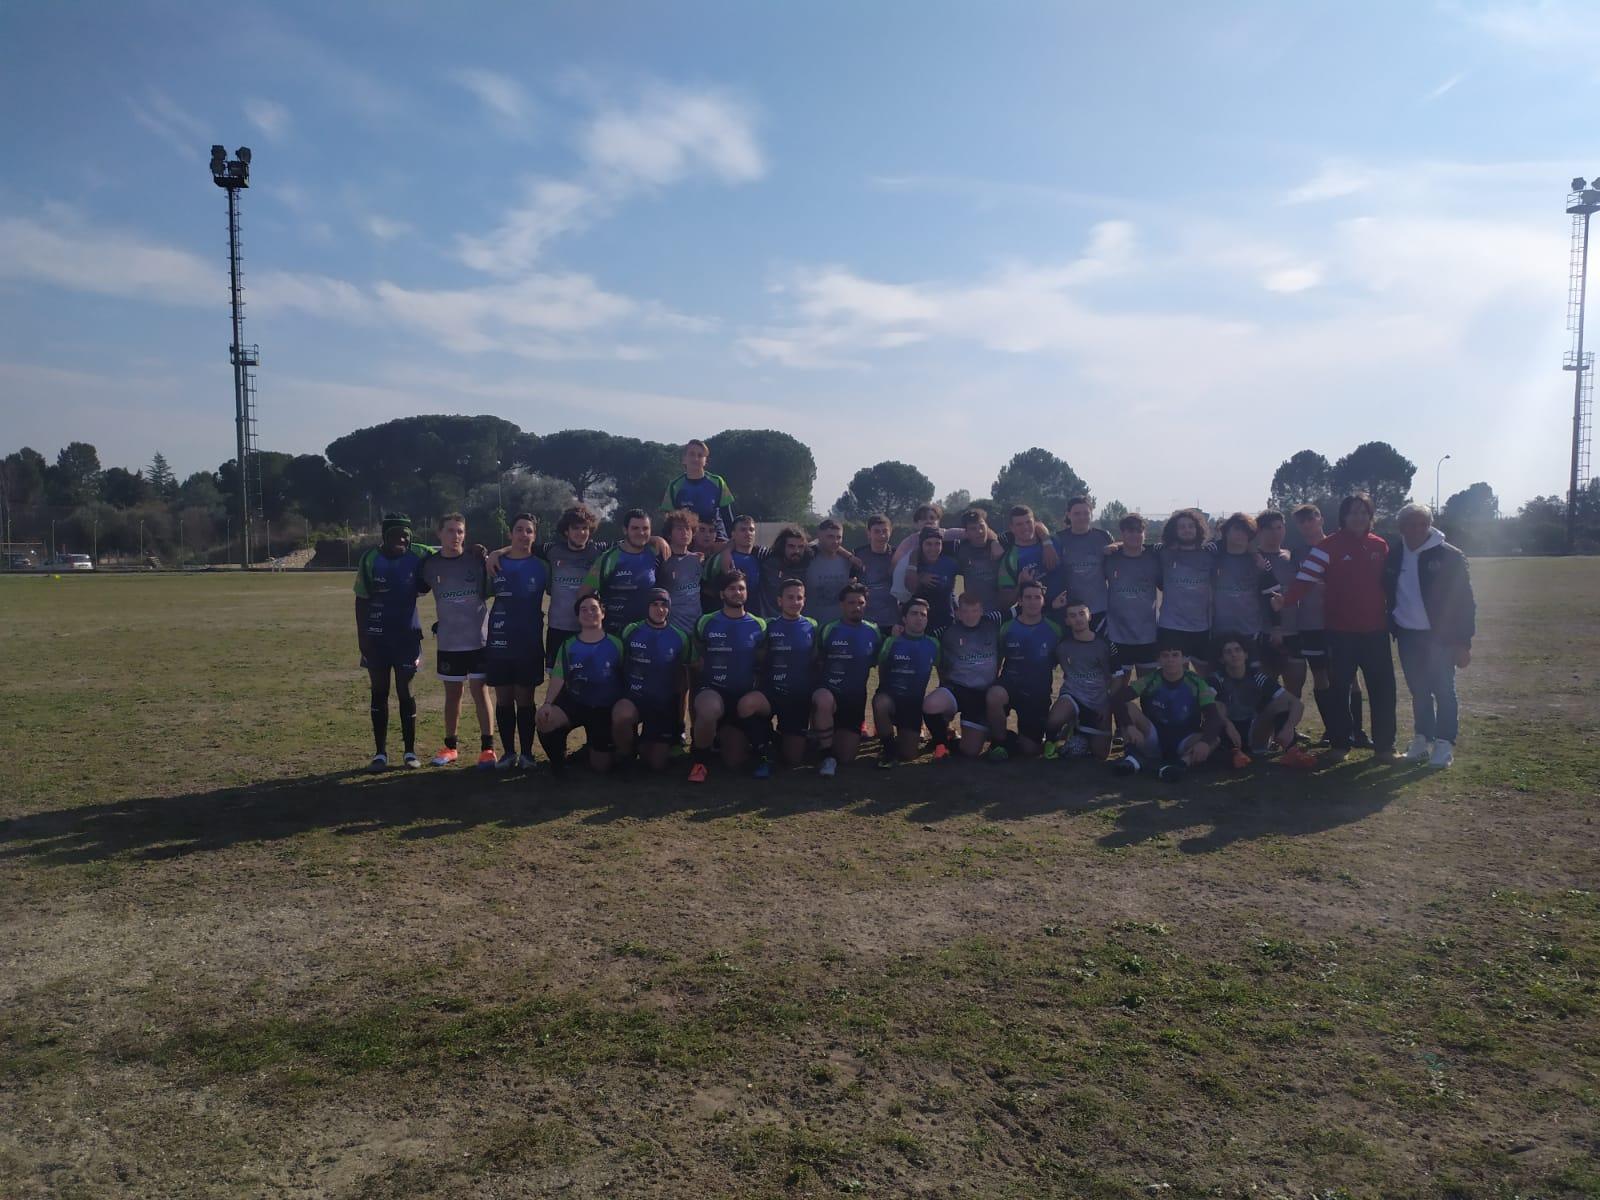 U18 maschile: Rugby Corato vs Rugby Napoli Afragola (0-64)